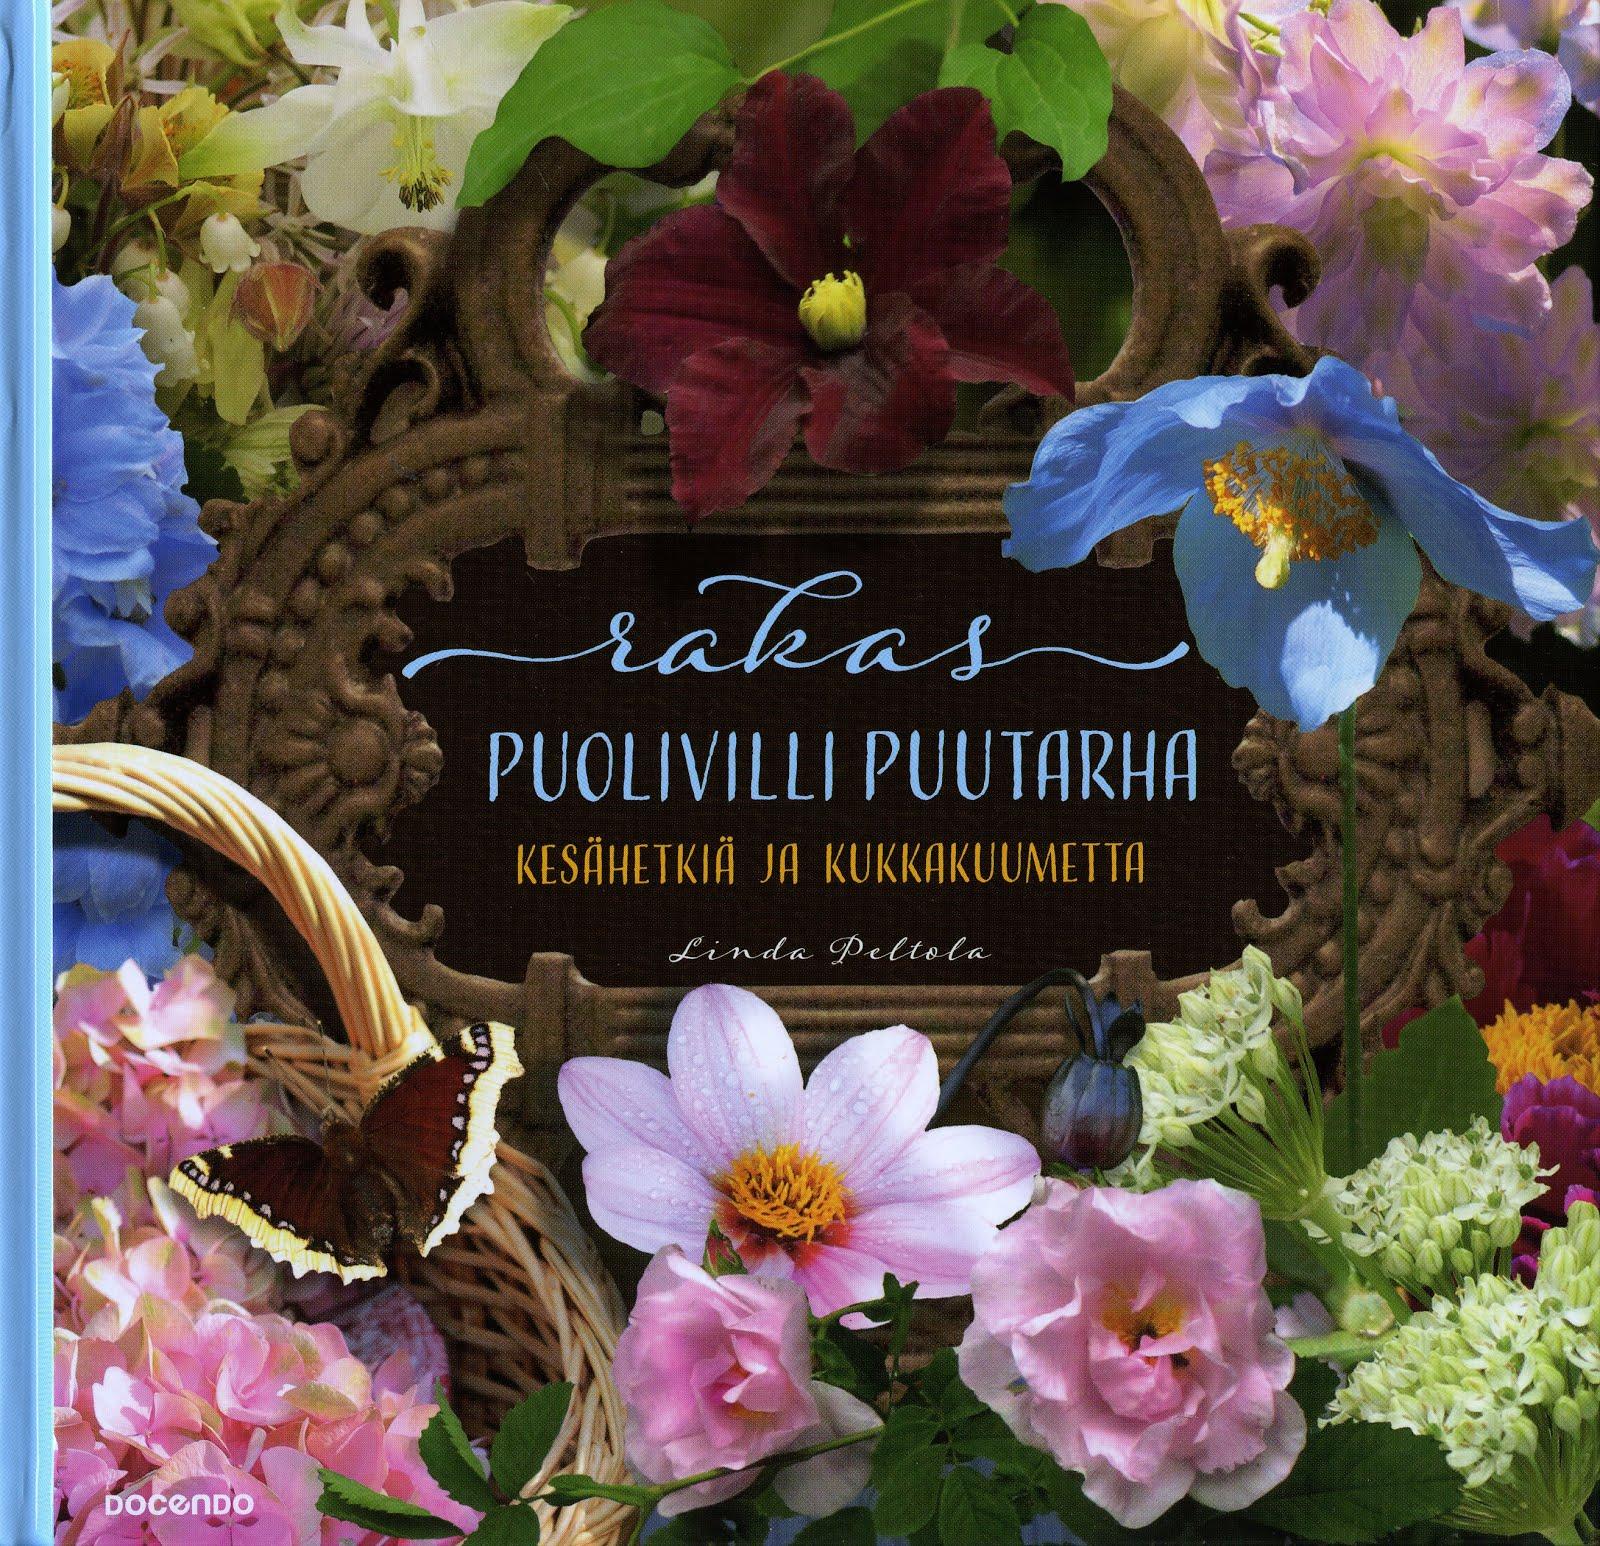 Linda Peltolan ihana kirja